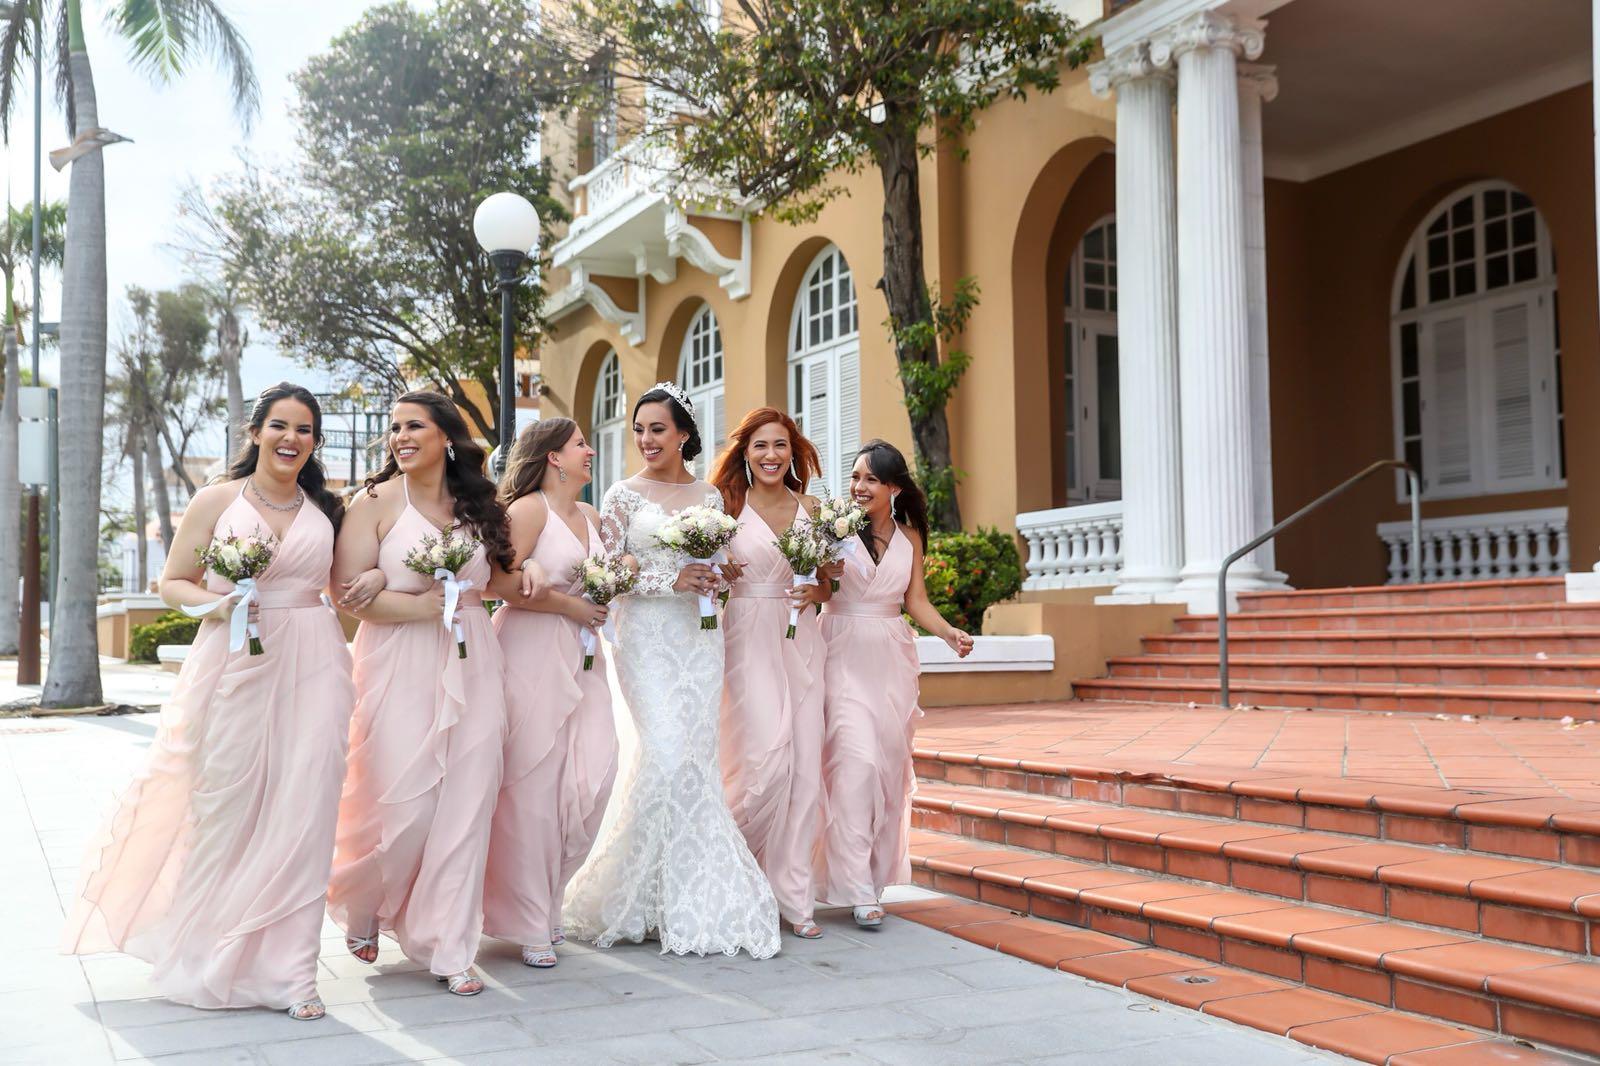 Eliana and her bridesmaids